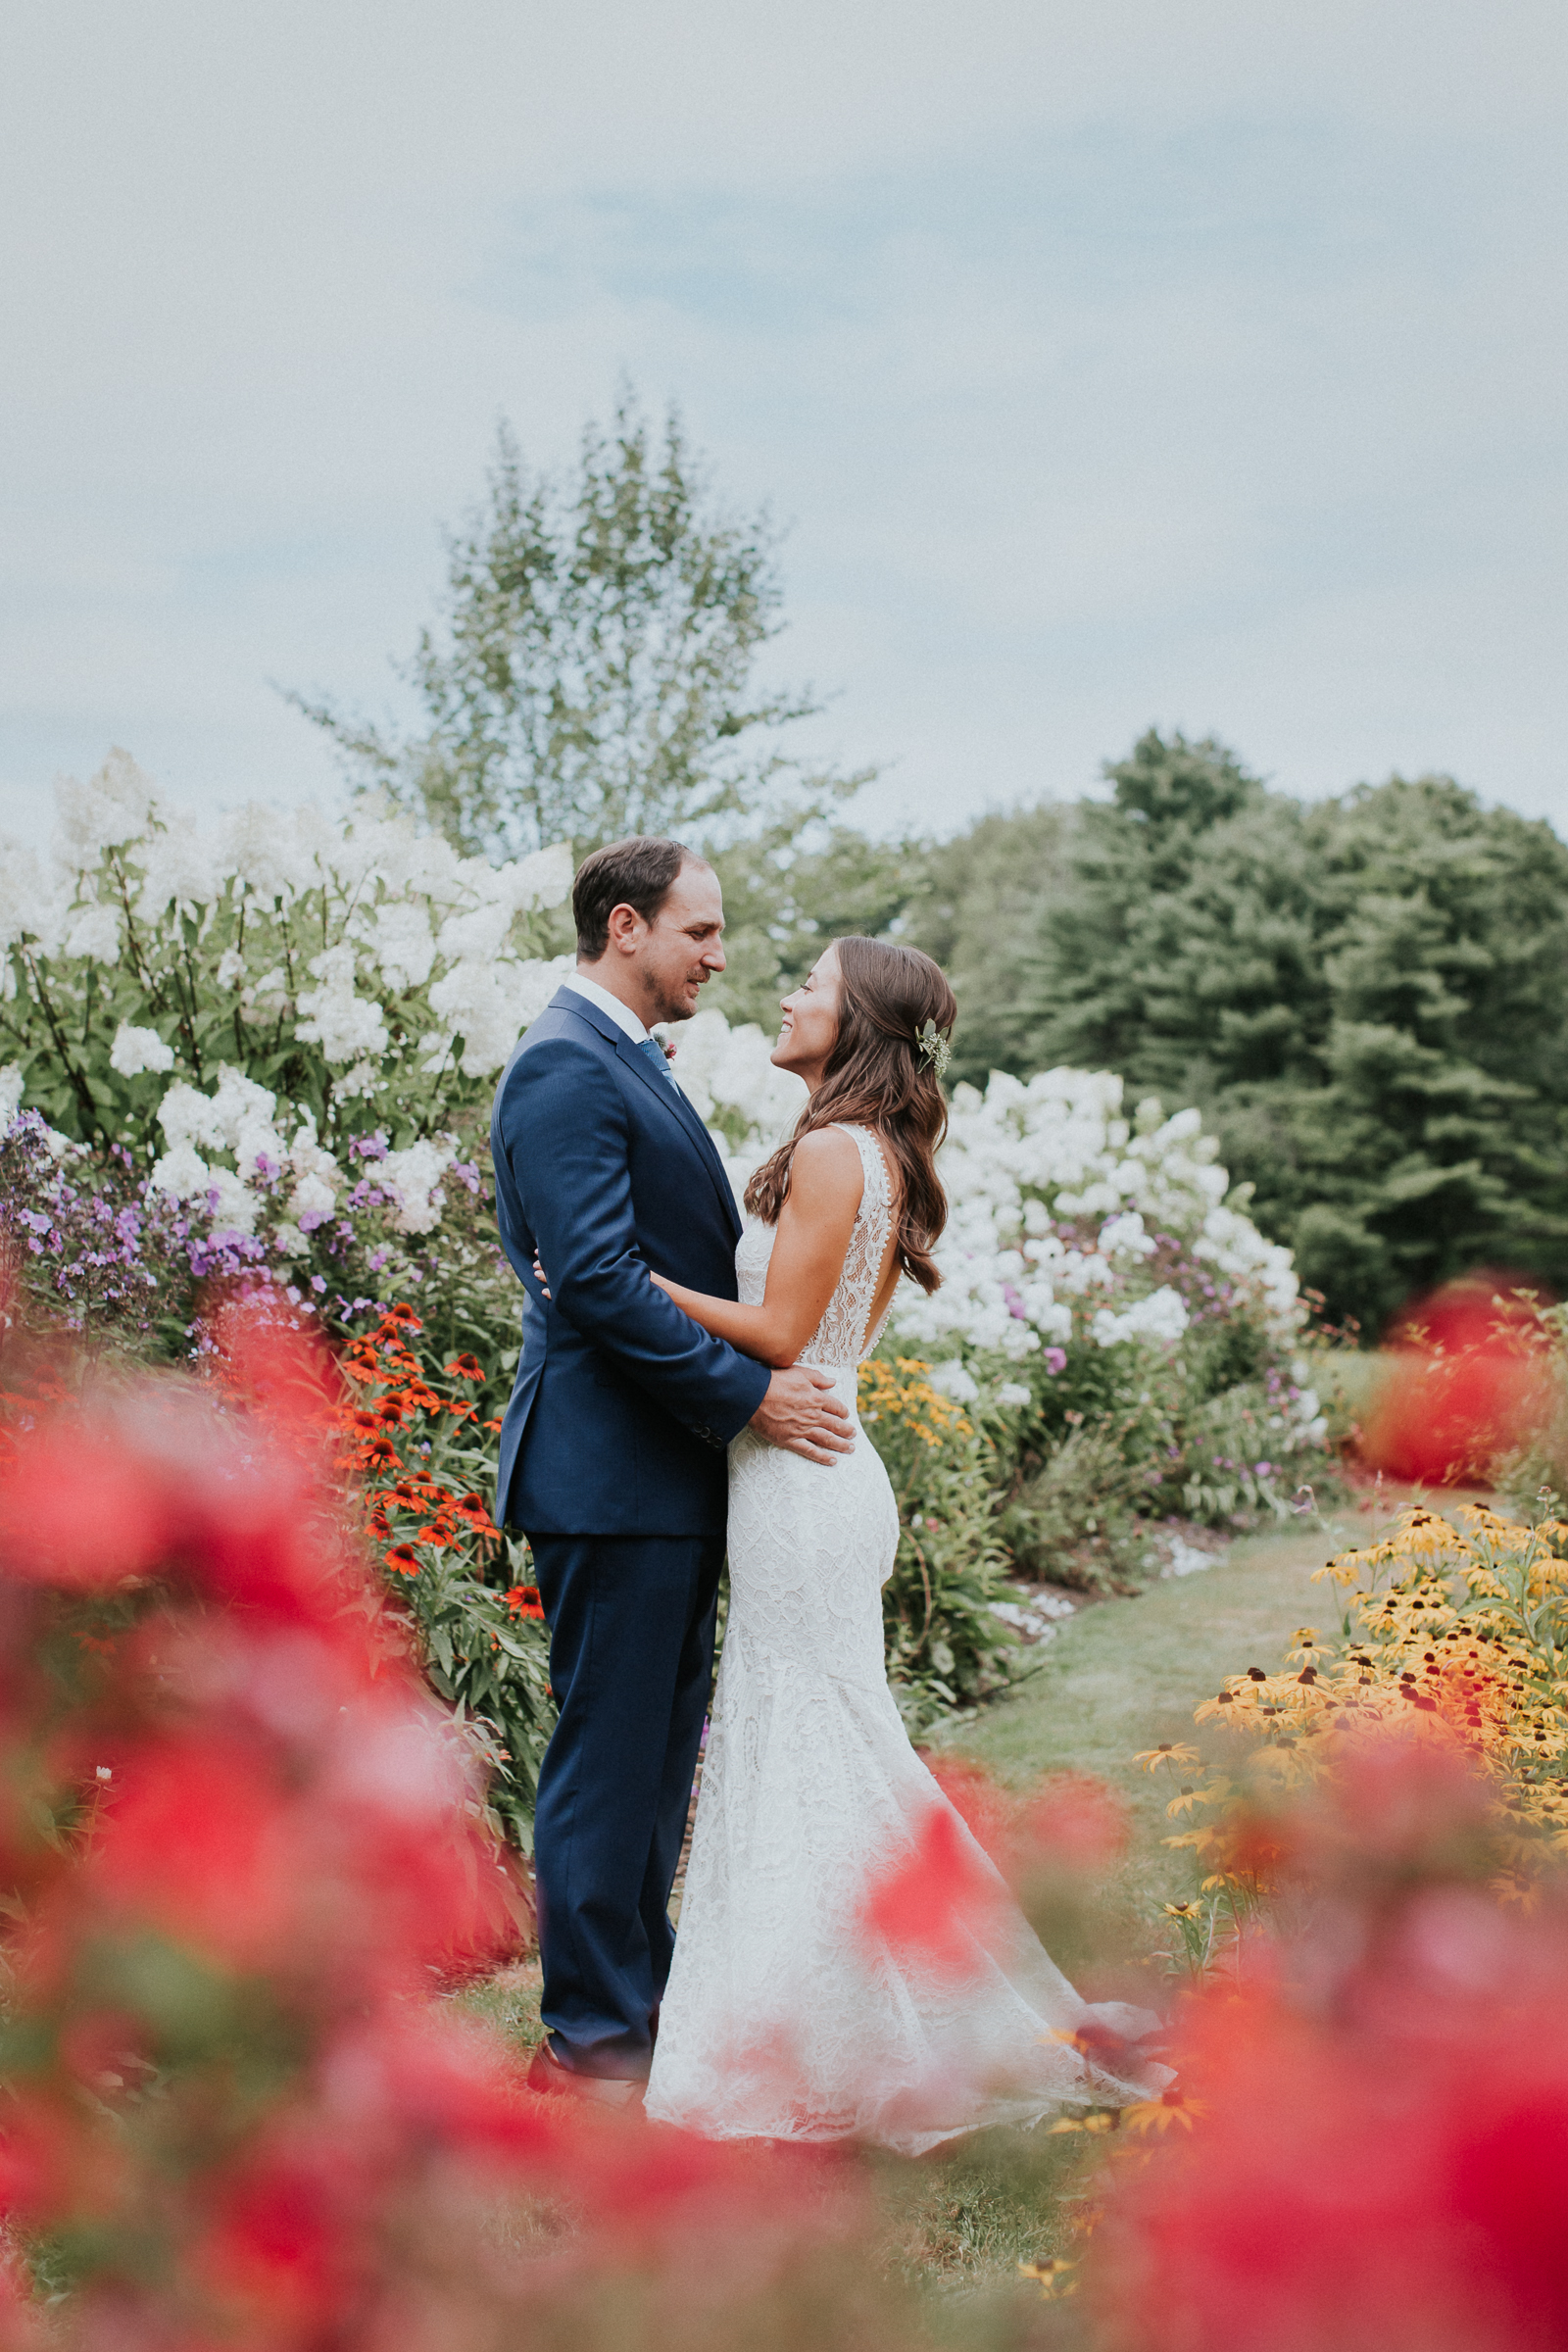 Marianmade-Farm-Wiscasset-Maine-Fine-Art-Documentary-Wedding-Photographer-Elvira-Kalviste-Photography-40.jpg